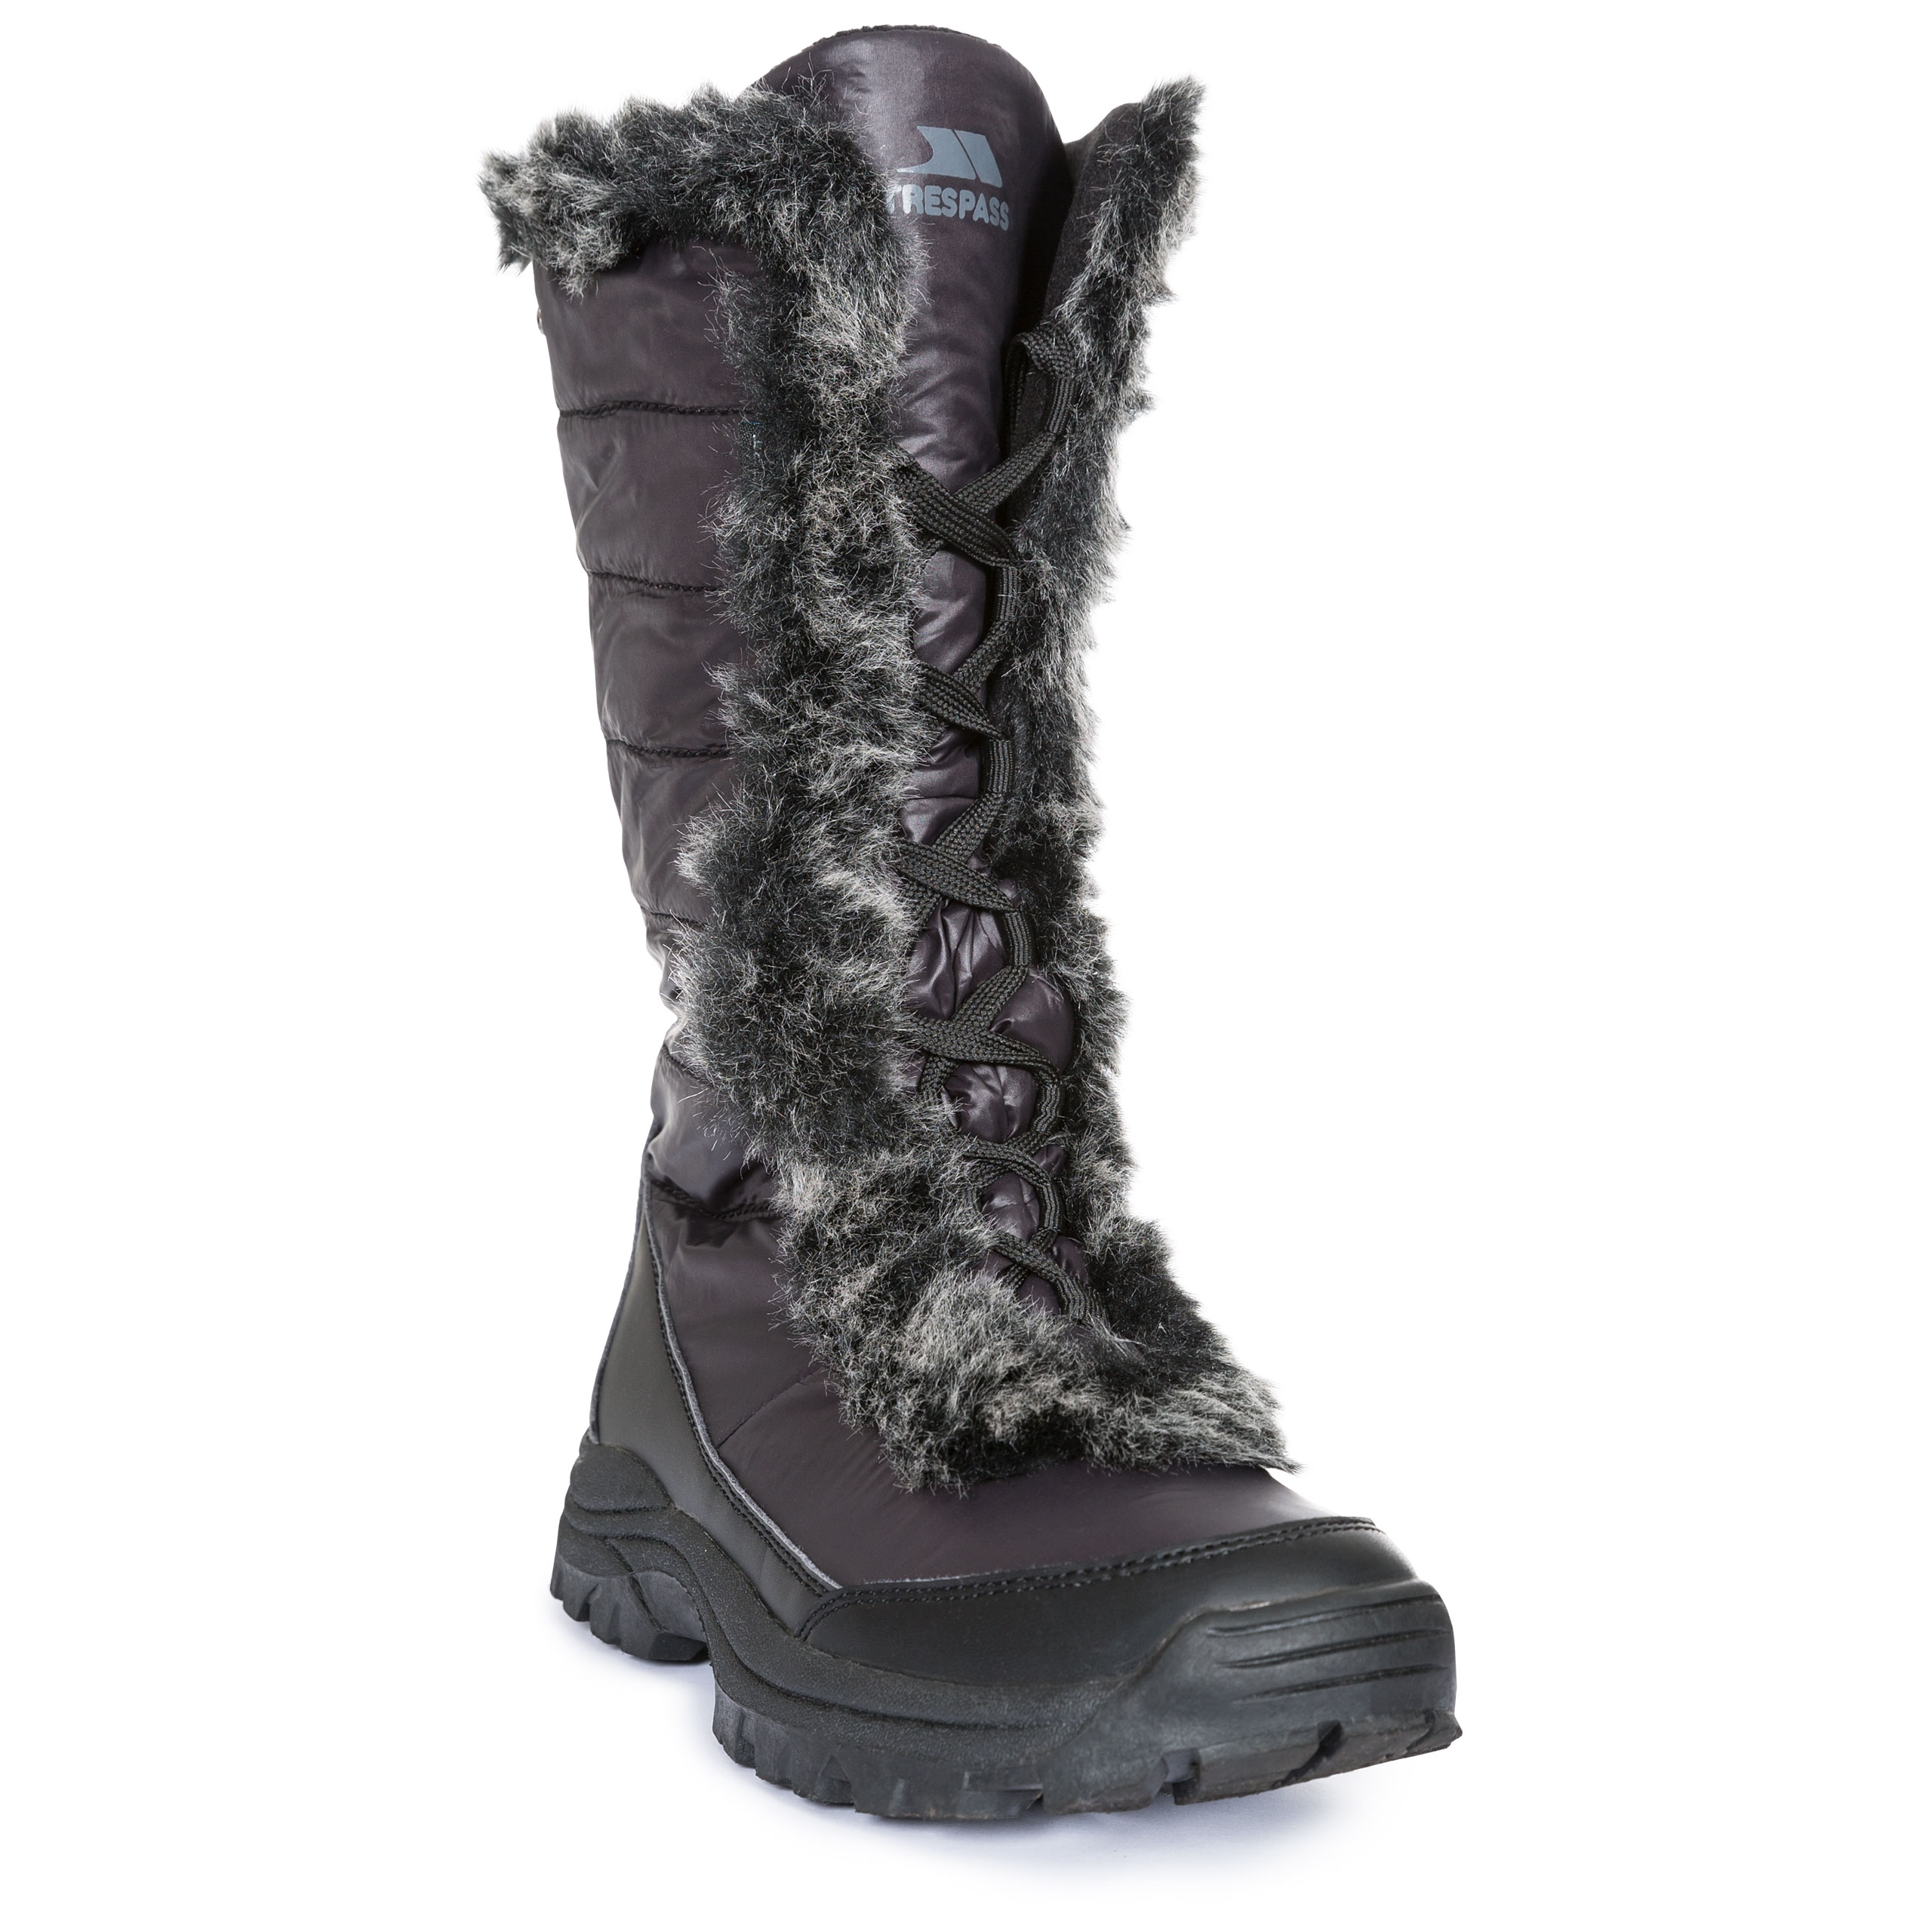 bff34dd5b3e77 Coretta Women's Fleece Lined Waterproof Snow Boots | Trespass UK